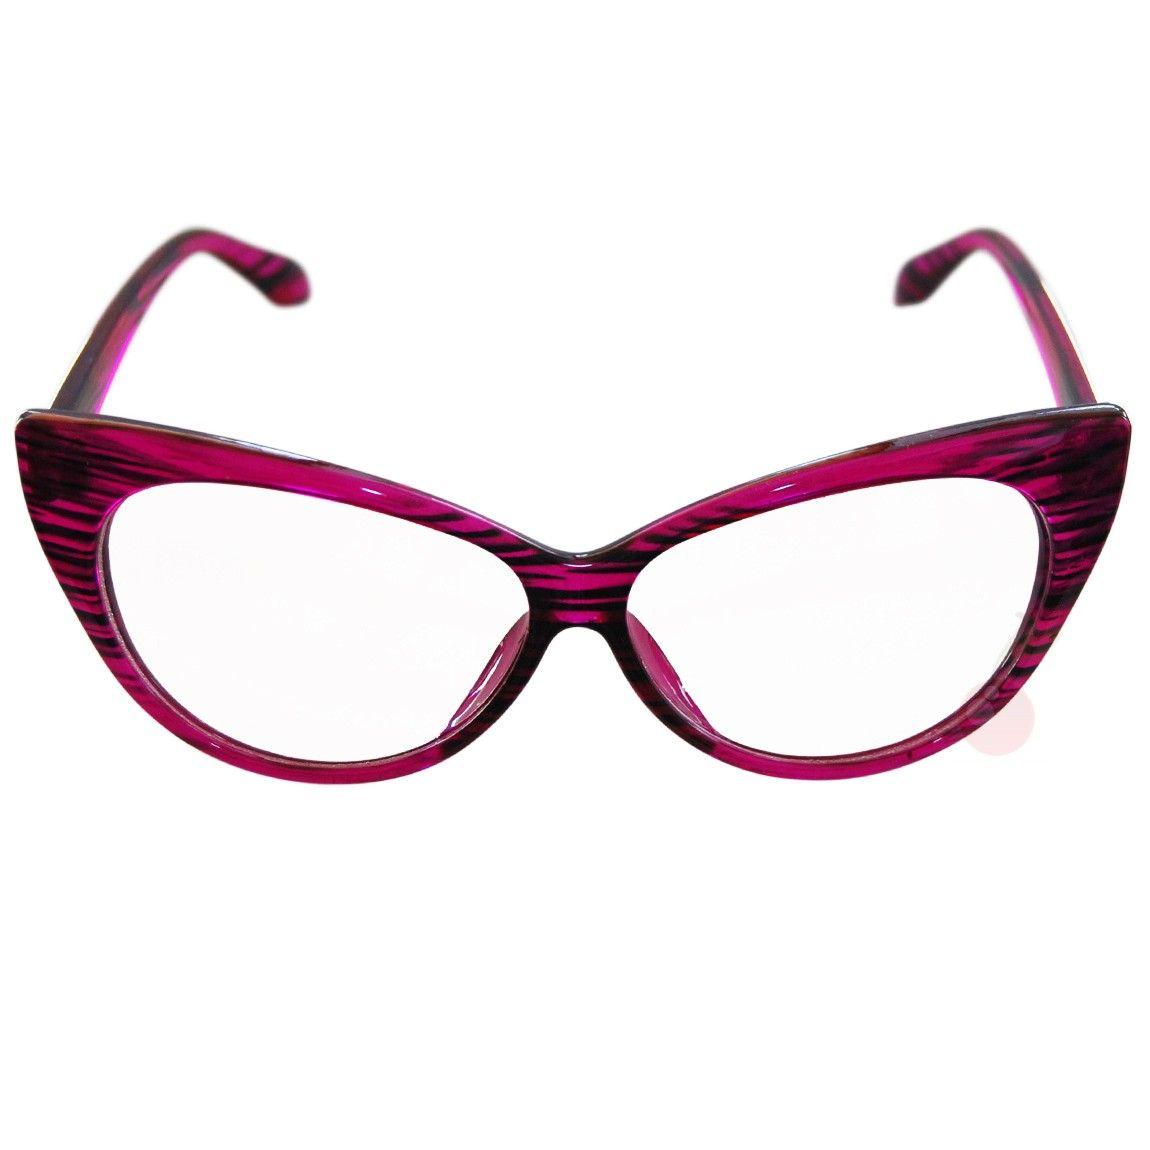 003dc21cf5e 50 s Style Cat Eye Glasses Pink Frame